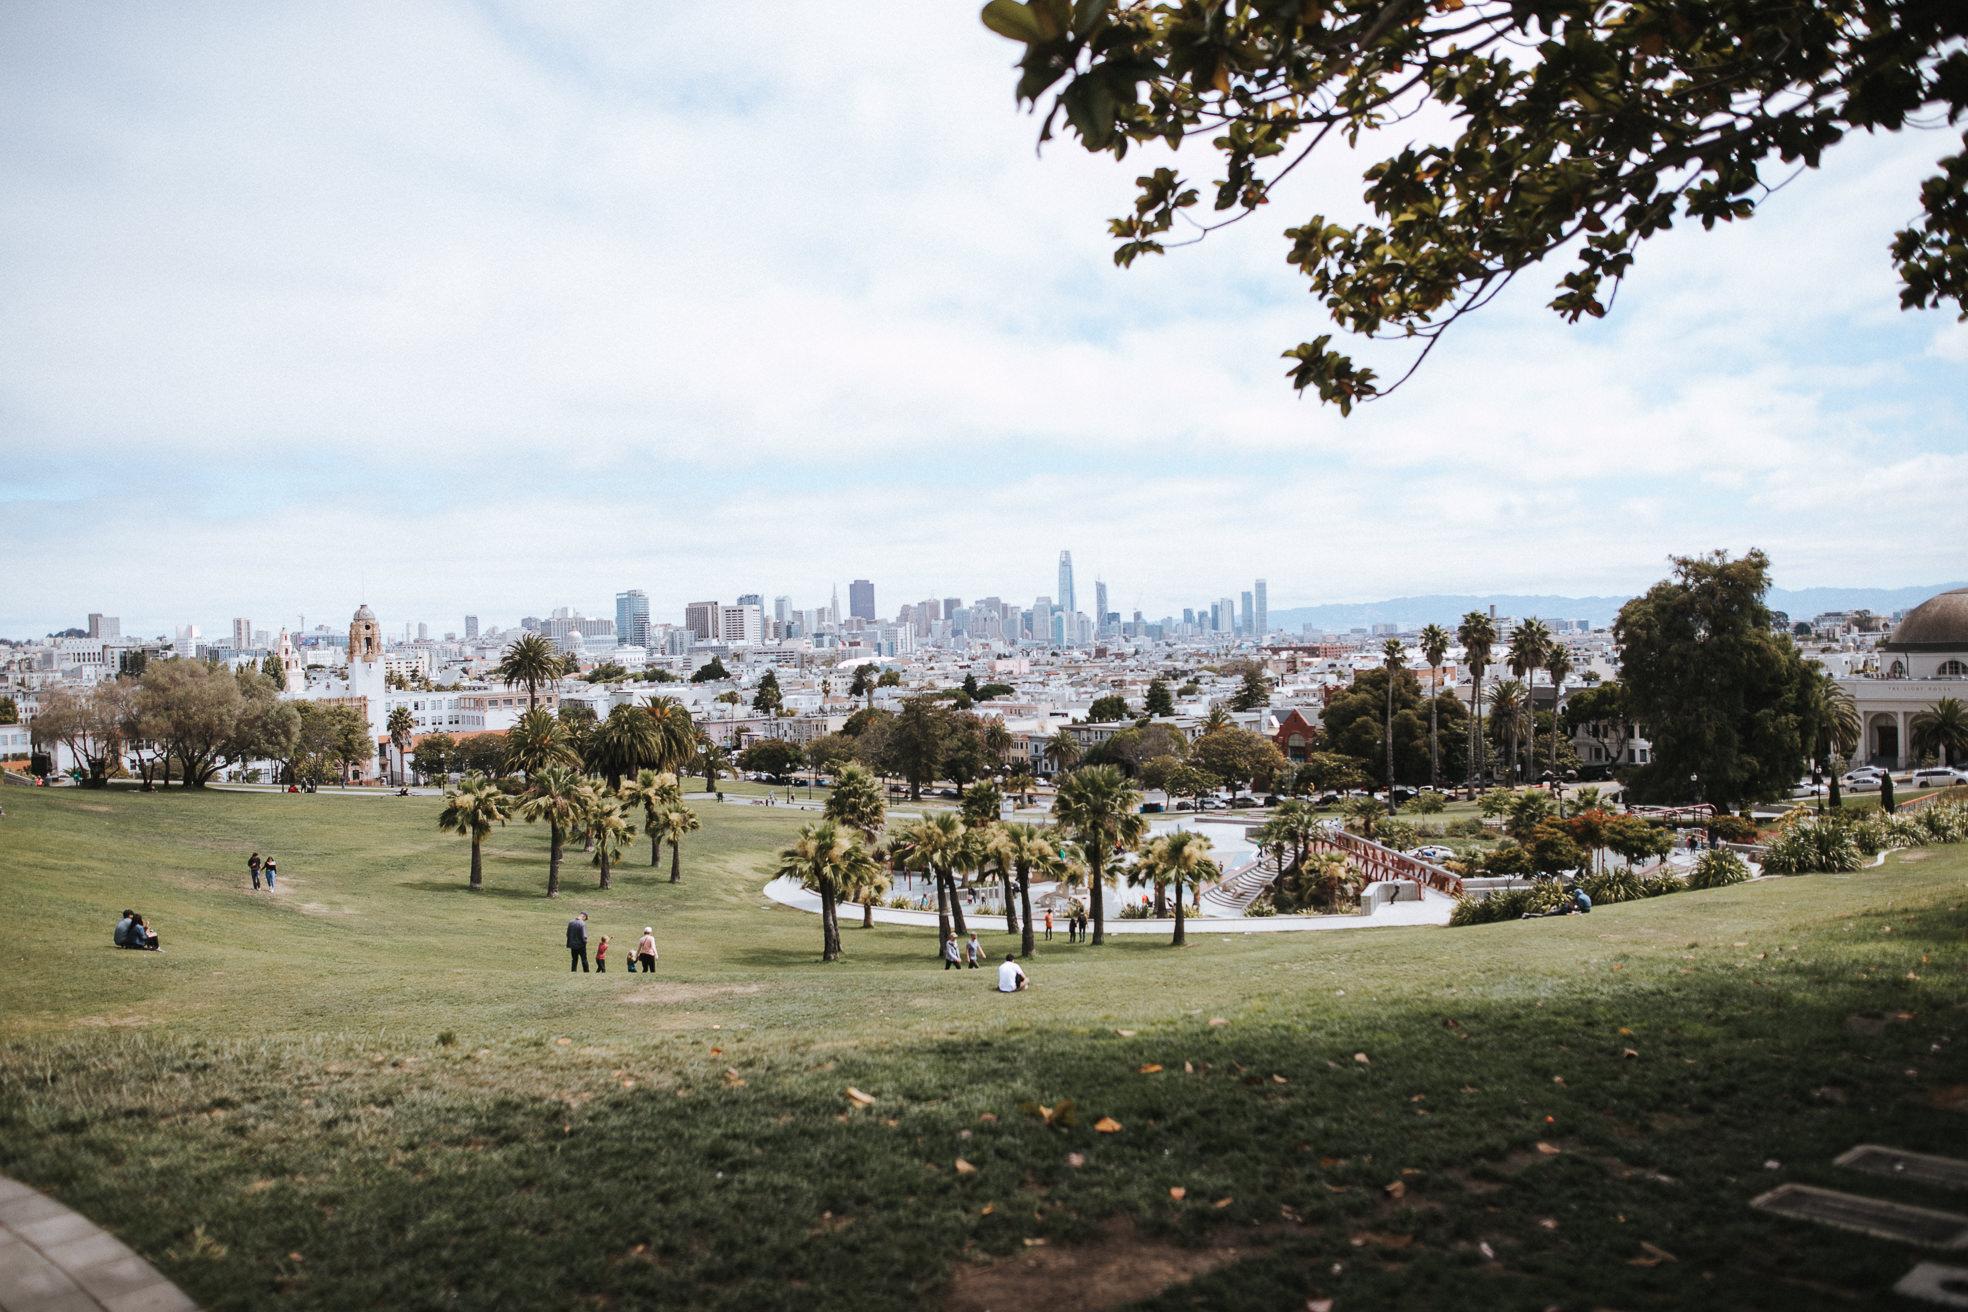 San-Francisco-BildervomLeben-4837